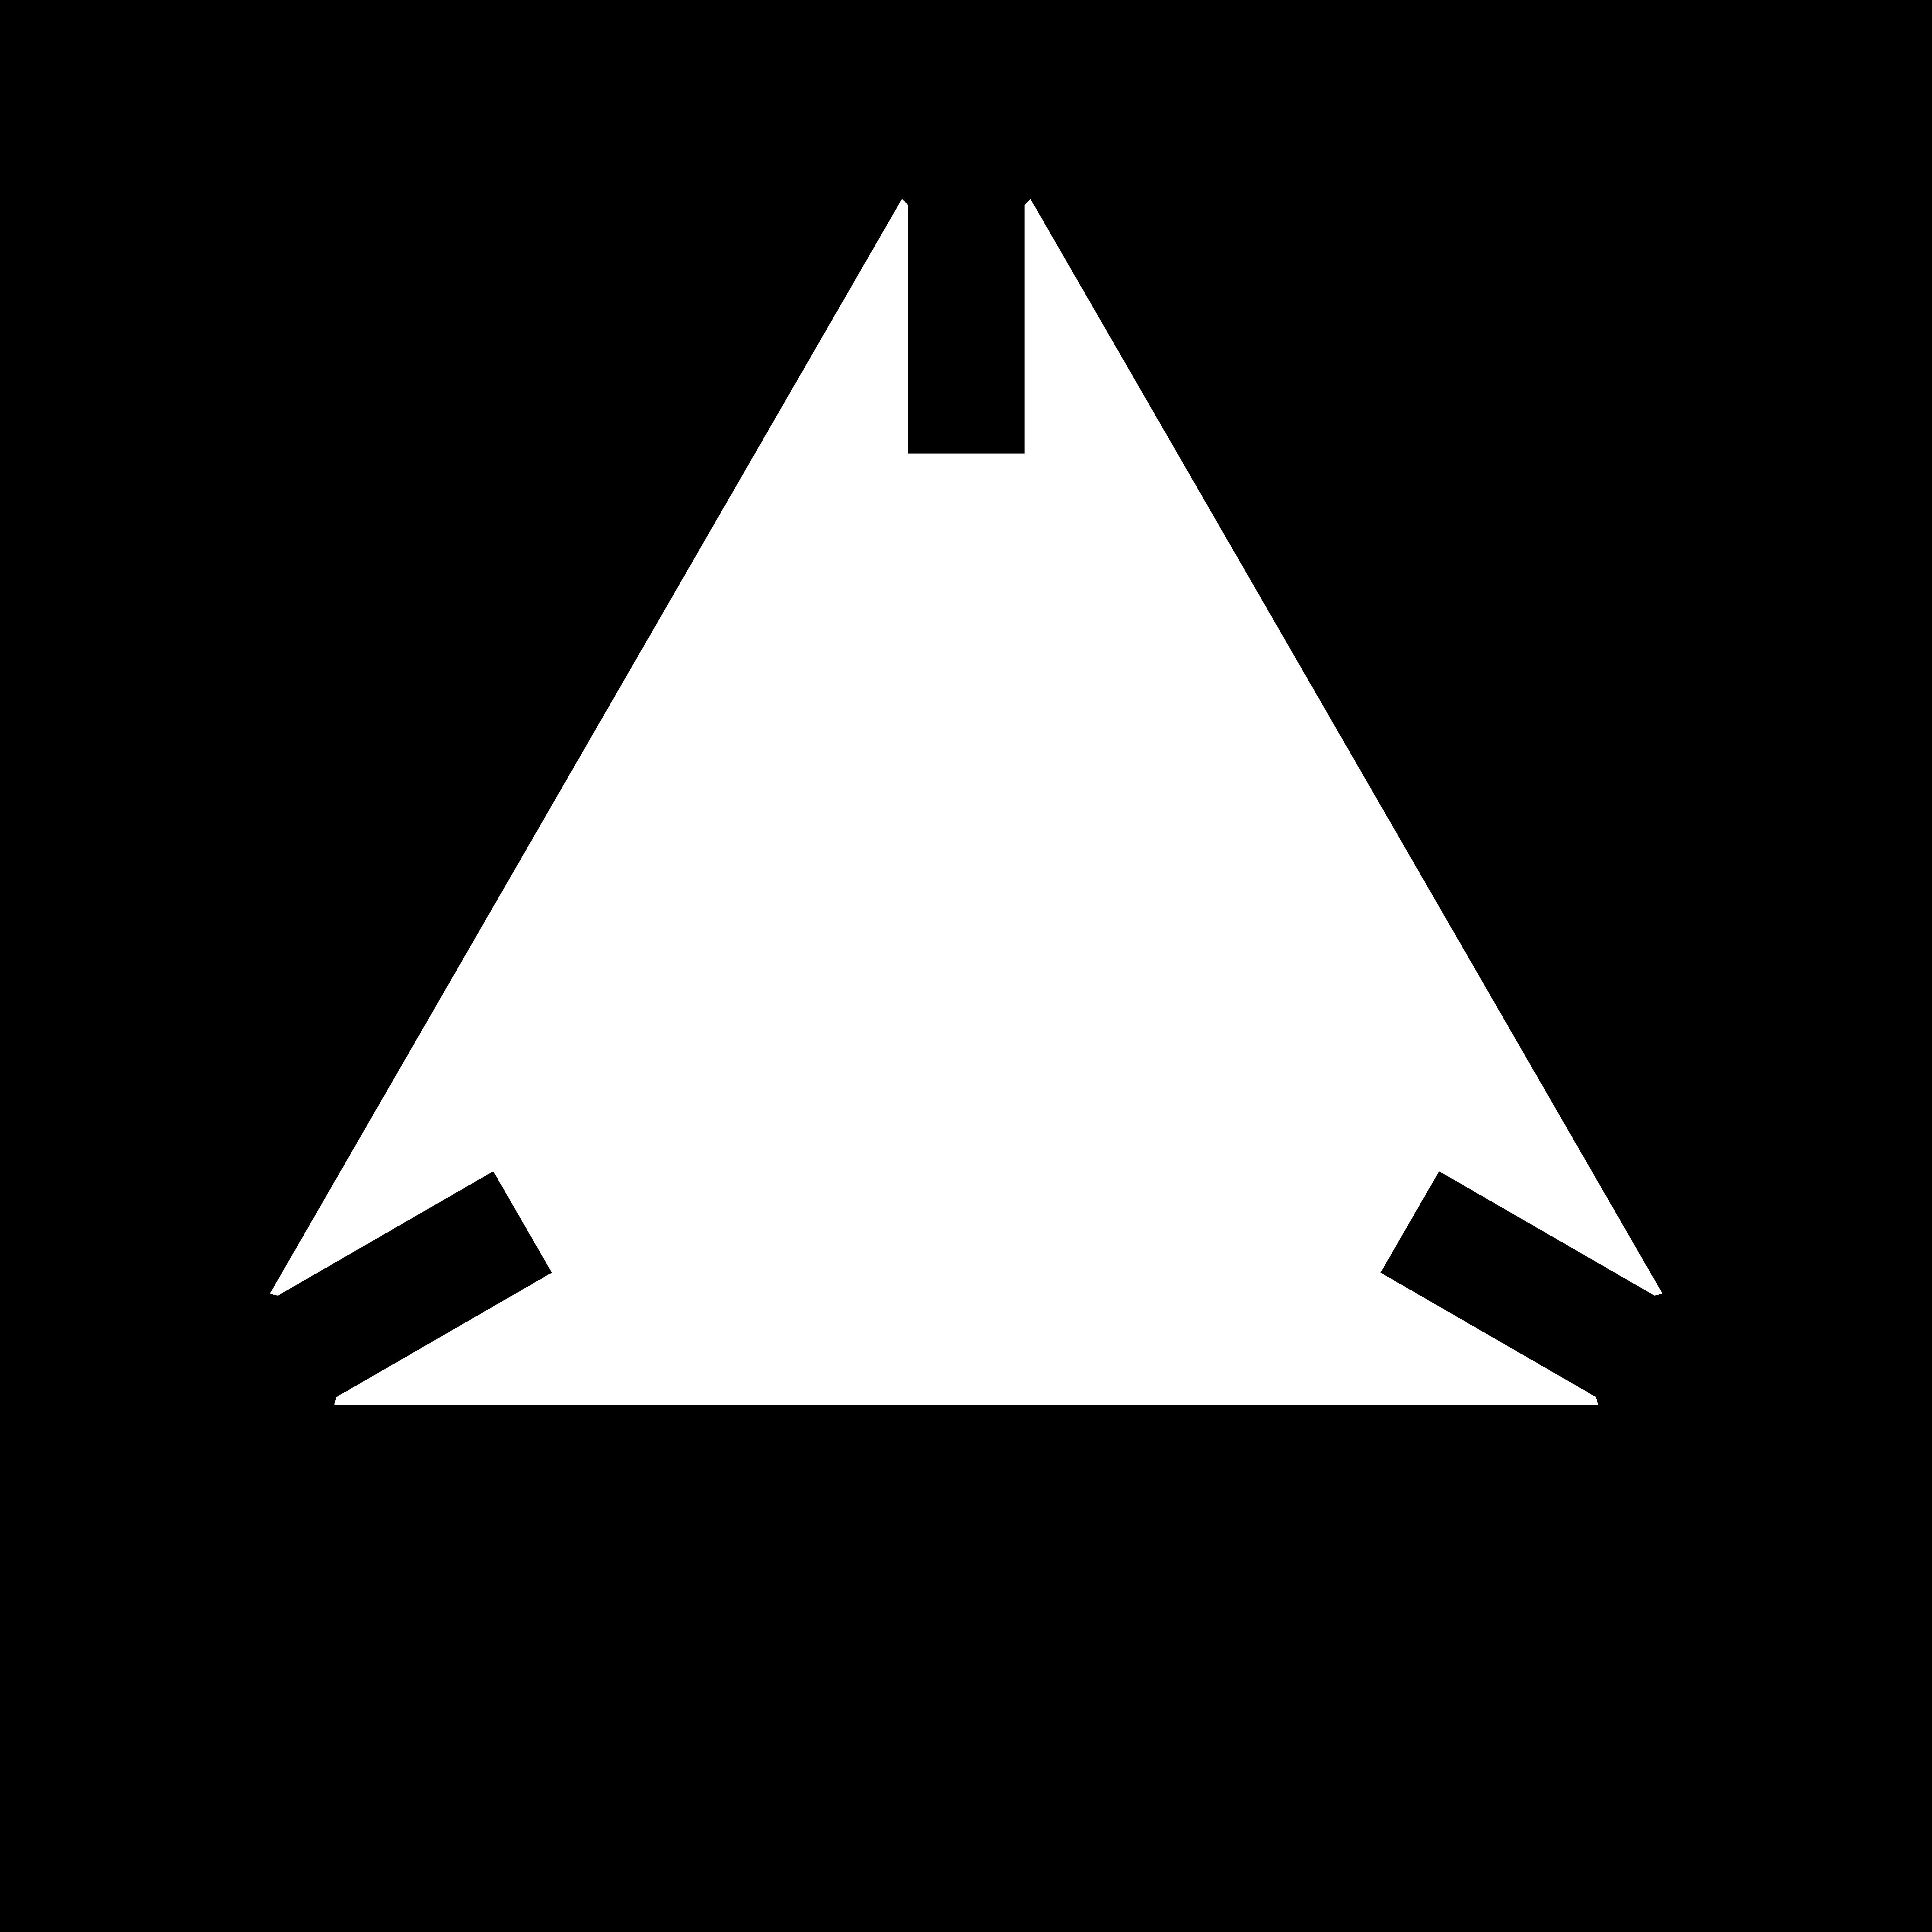 docs/cad files/week4/Gik Triangle.png